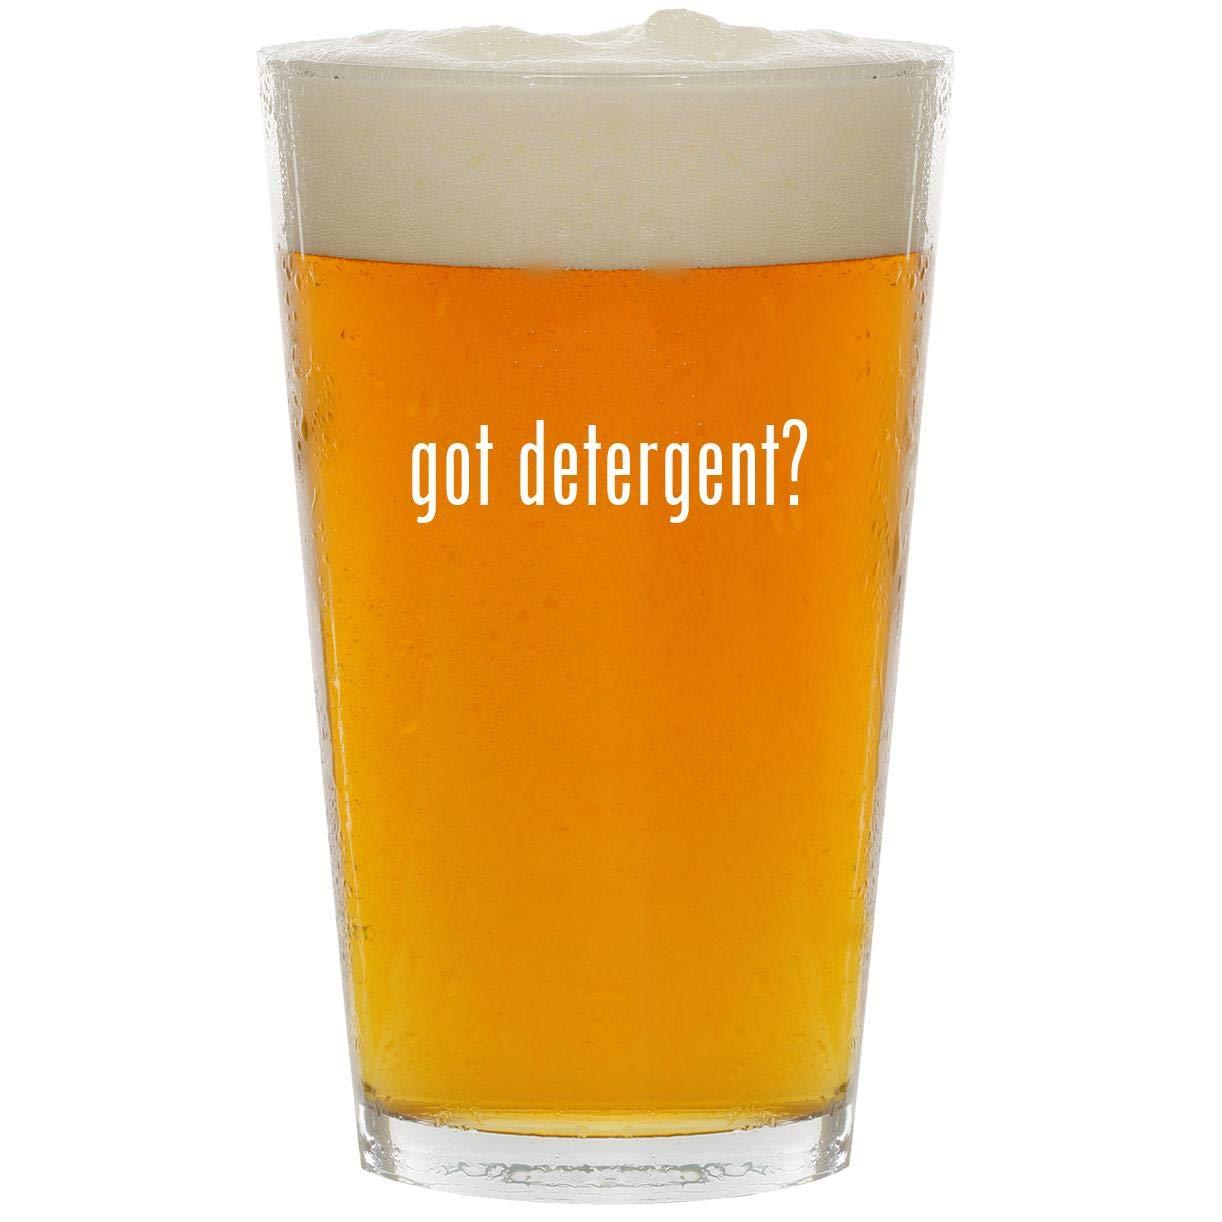 got detergent? - Glass 16oz Beer Pint